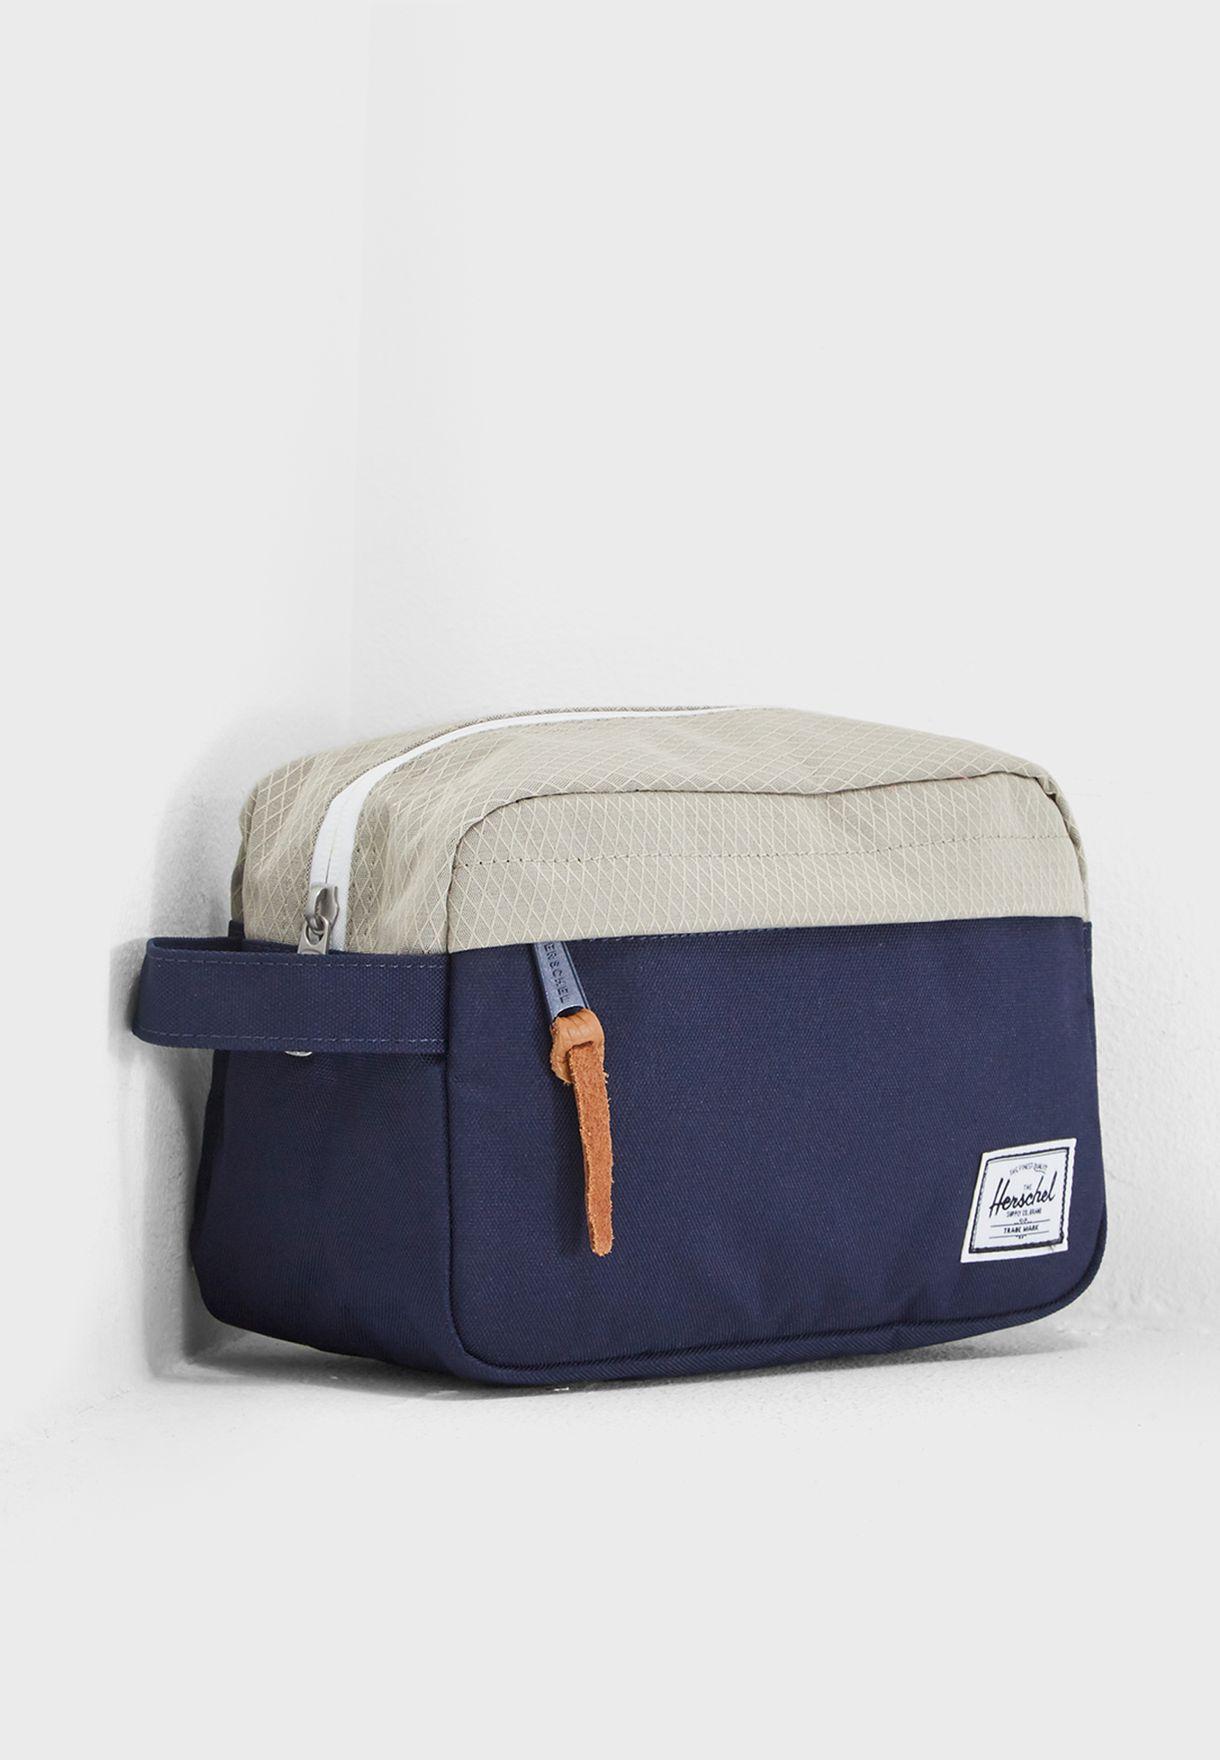 78ec7b02daf3 Shop Herschel navy Chapter Toiletry Bag 10039-02146-OS for Men in ...